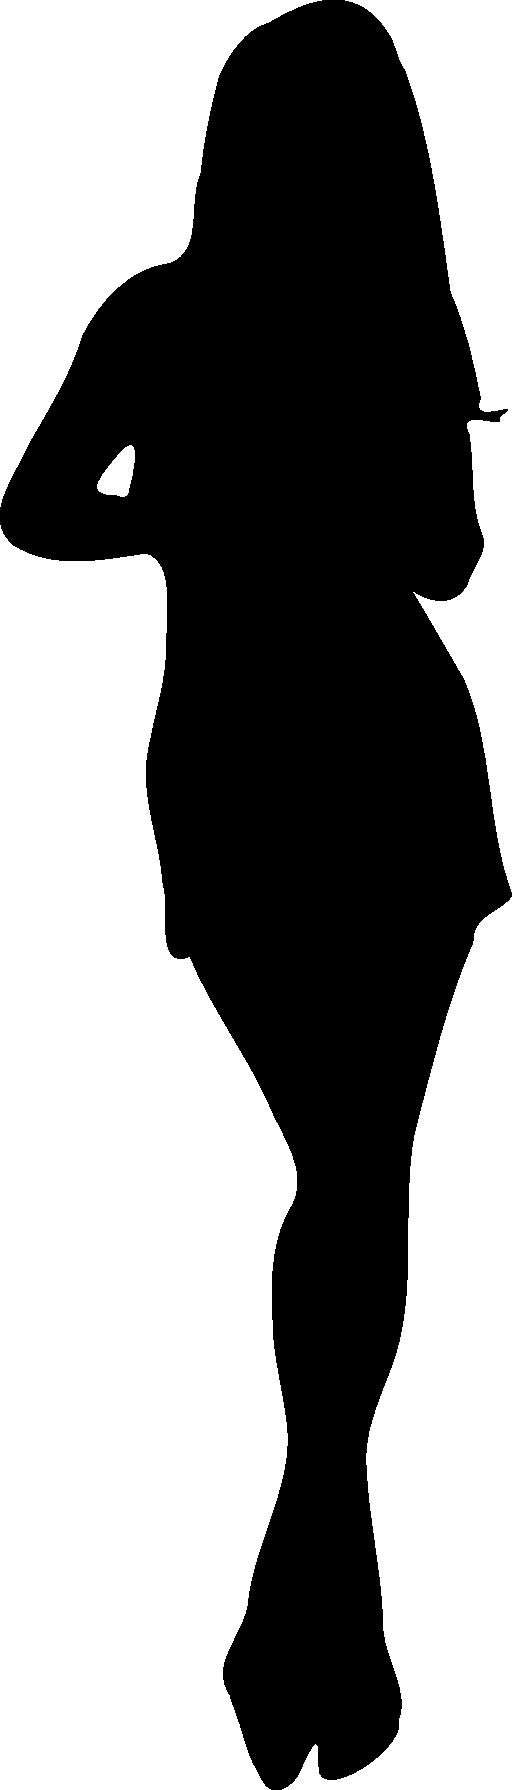 512x1790 Clipart Girl Silhouette